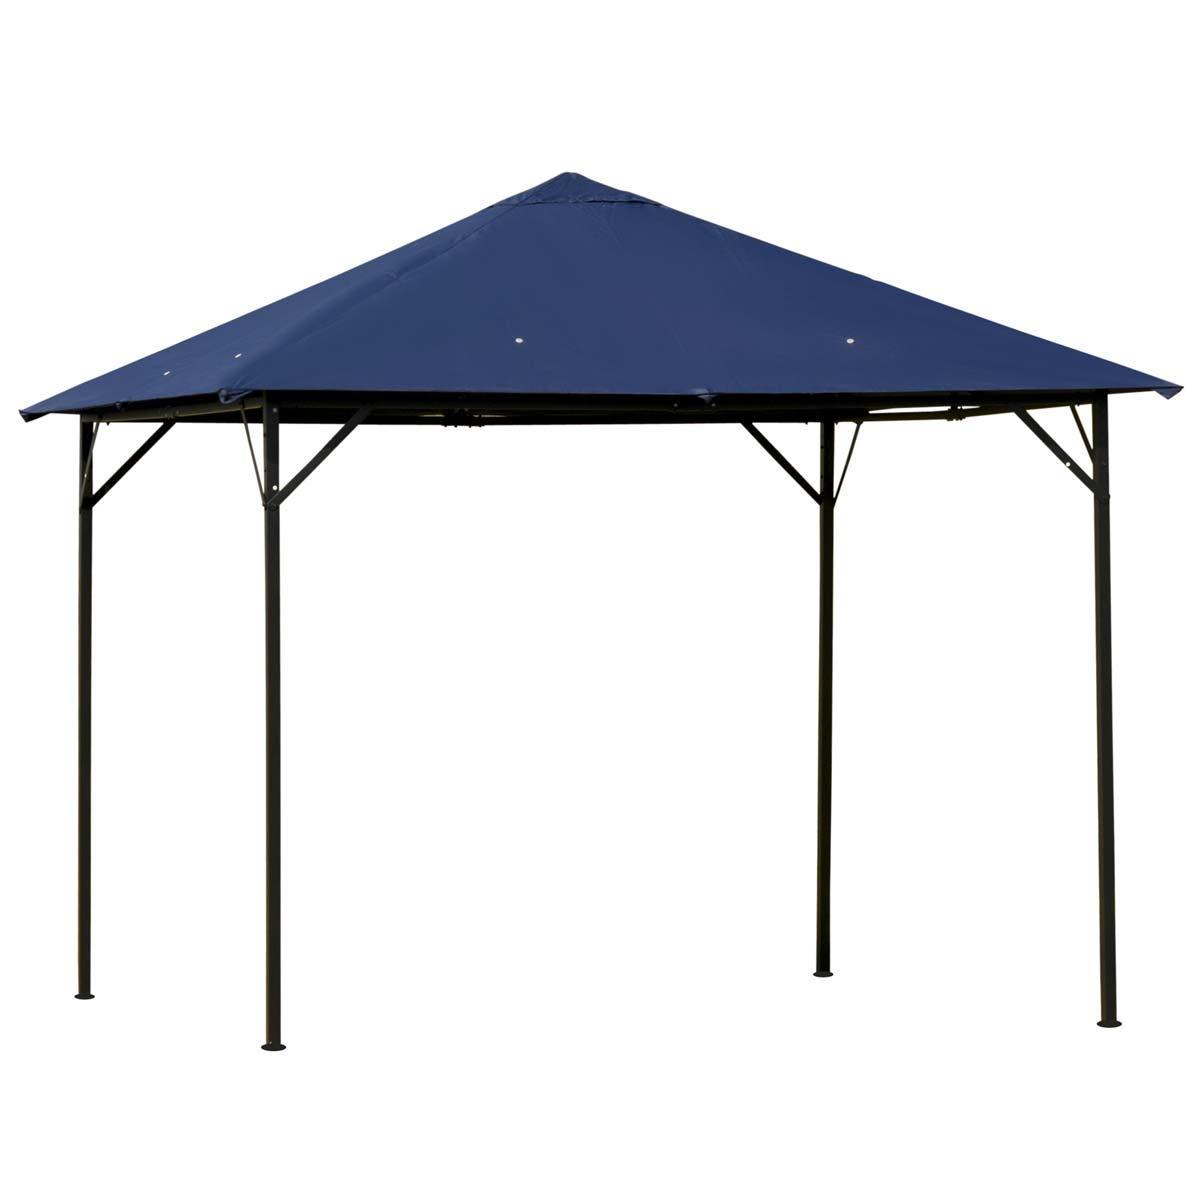 Outsunny 3 x 3m Outdoor Gazebo Shelter - Blue